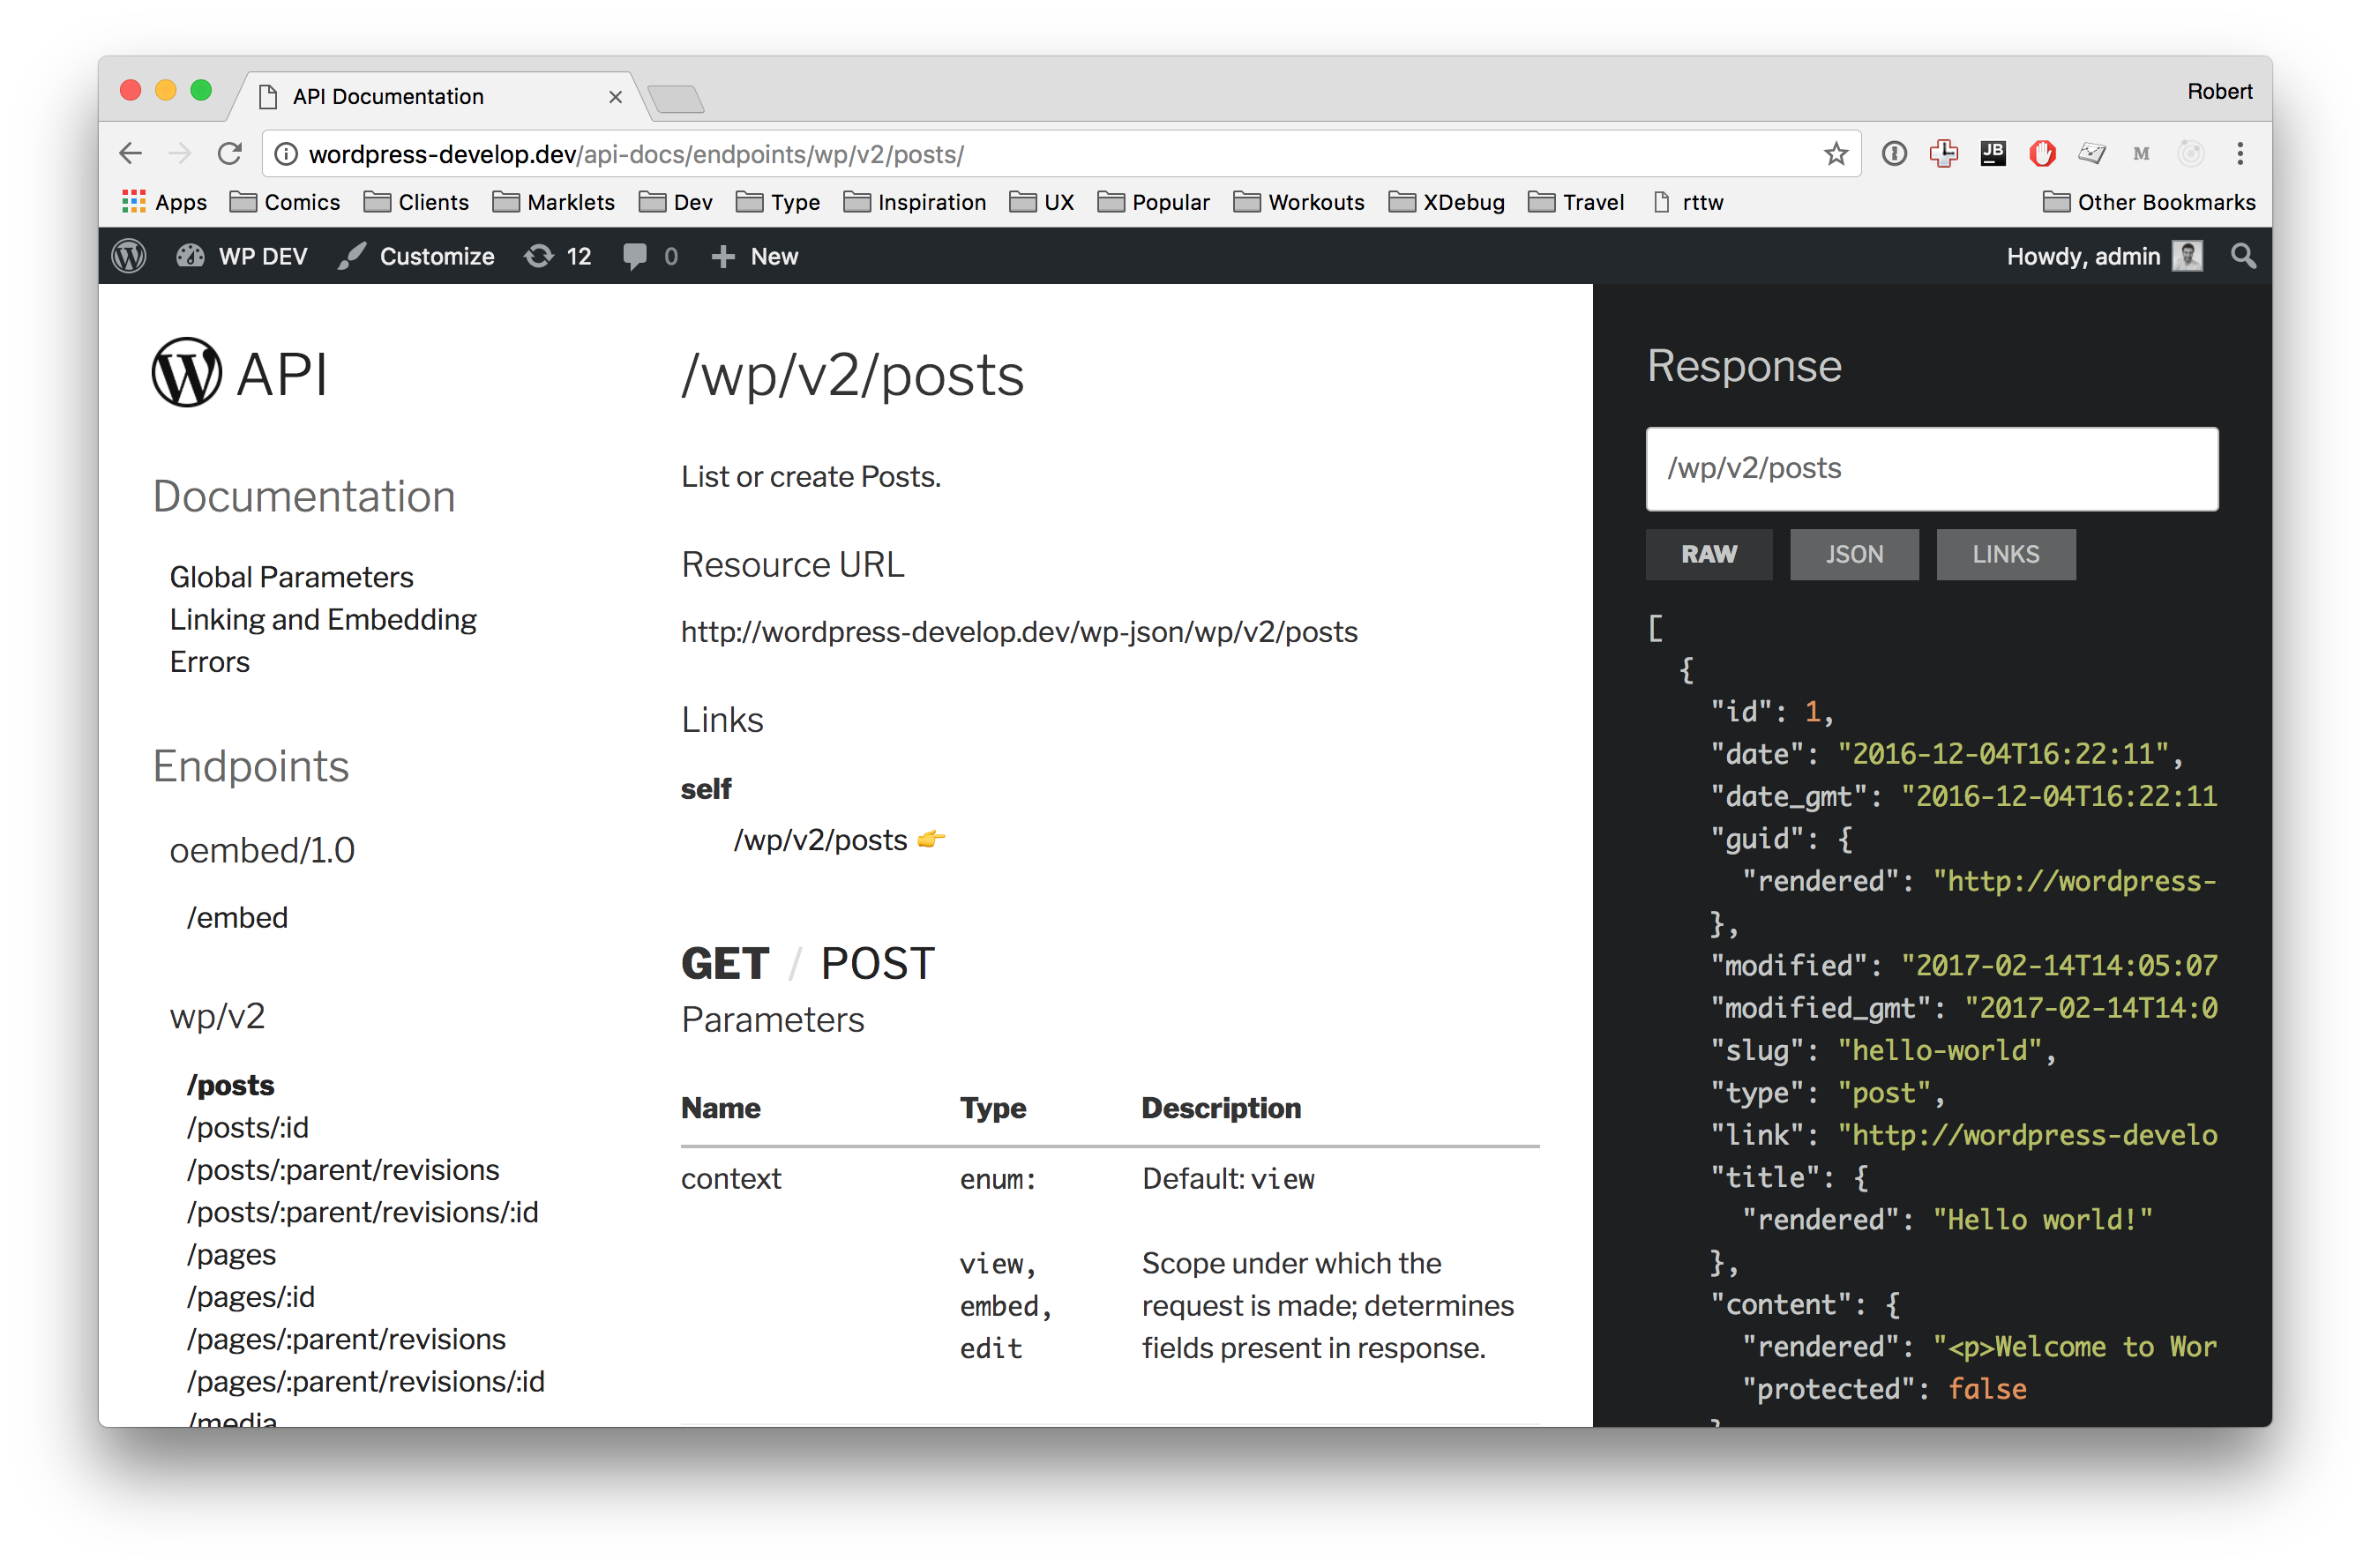 GitHub - humanmade/Restsplain: WordPress REST API documentation